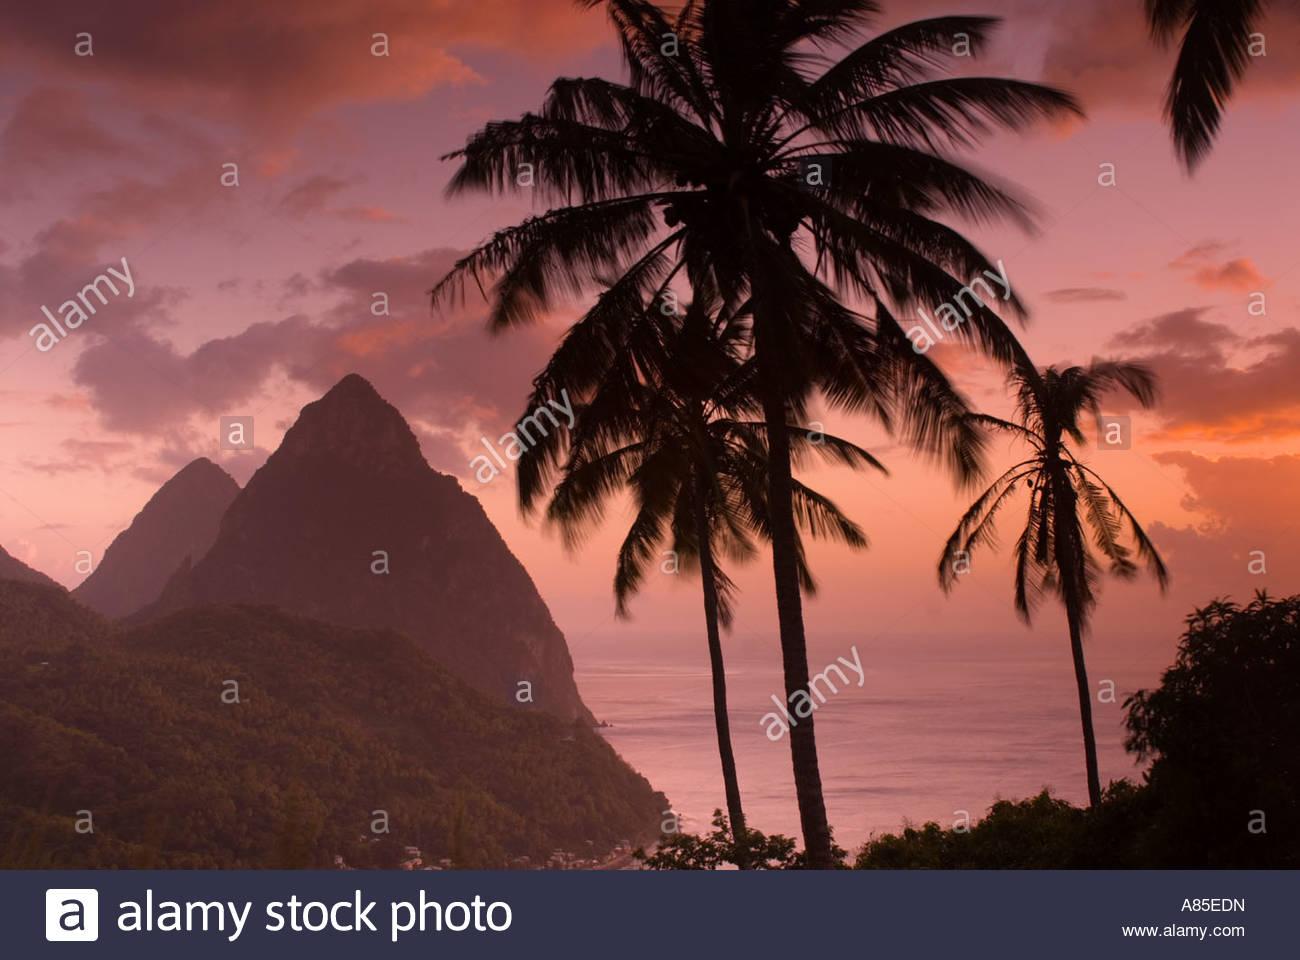 Die pitons bei Sonnenuntergang, St Lucia, Windward Islands, Karibik Stockbild